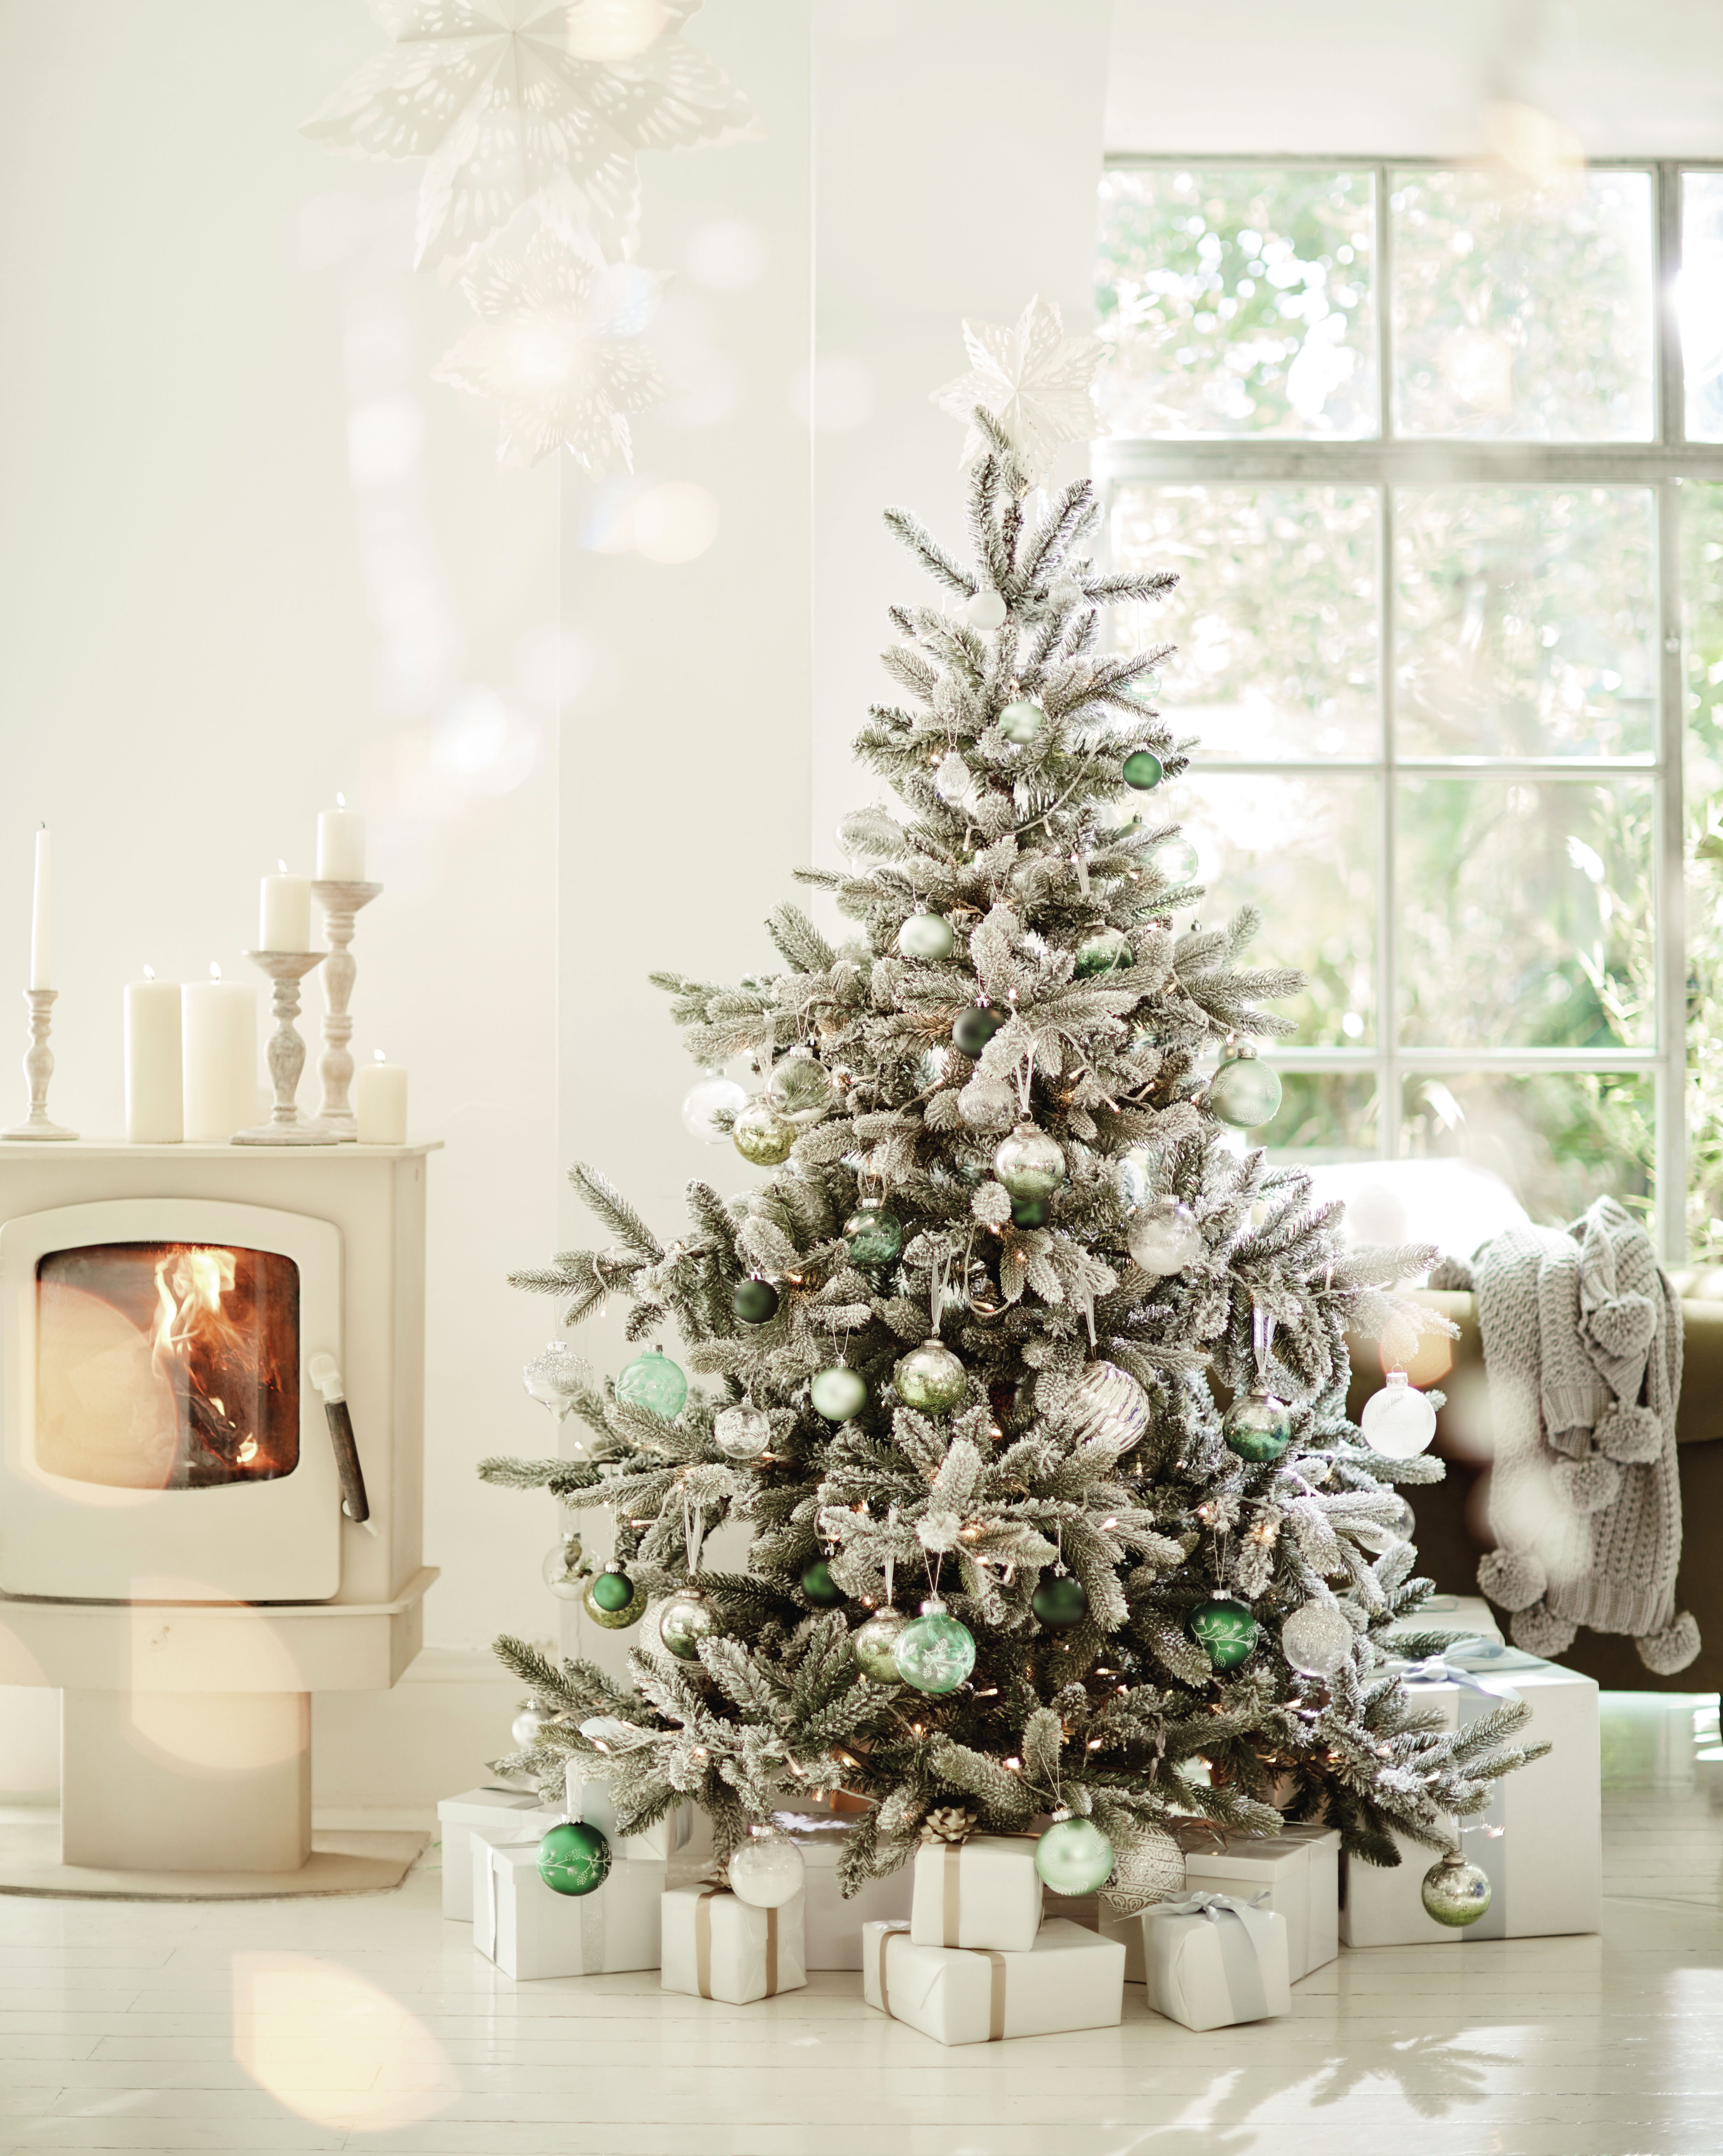 Marks & Spencer Christmas tree